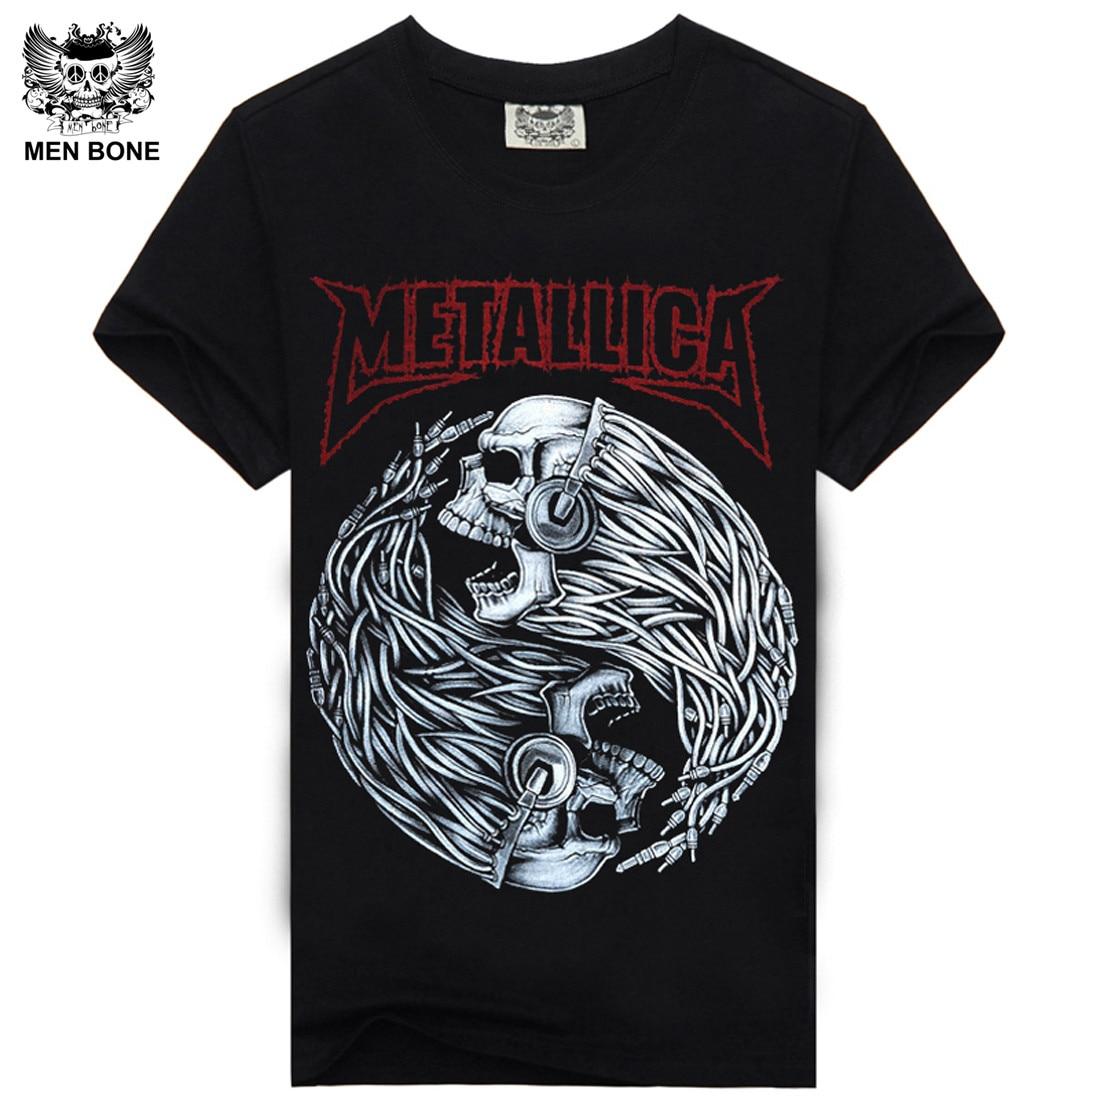 mne bone tee men black t shirt 100 cotton metallica skull print heavy metal rock hip hop. Black Bedroom Furniture Sets. Home Design Ideas